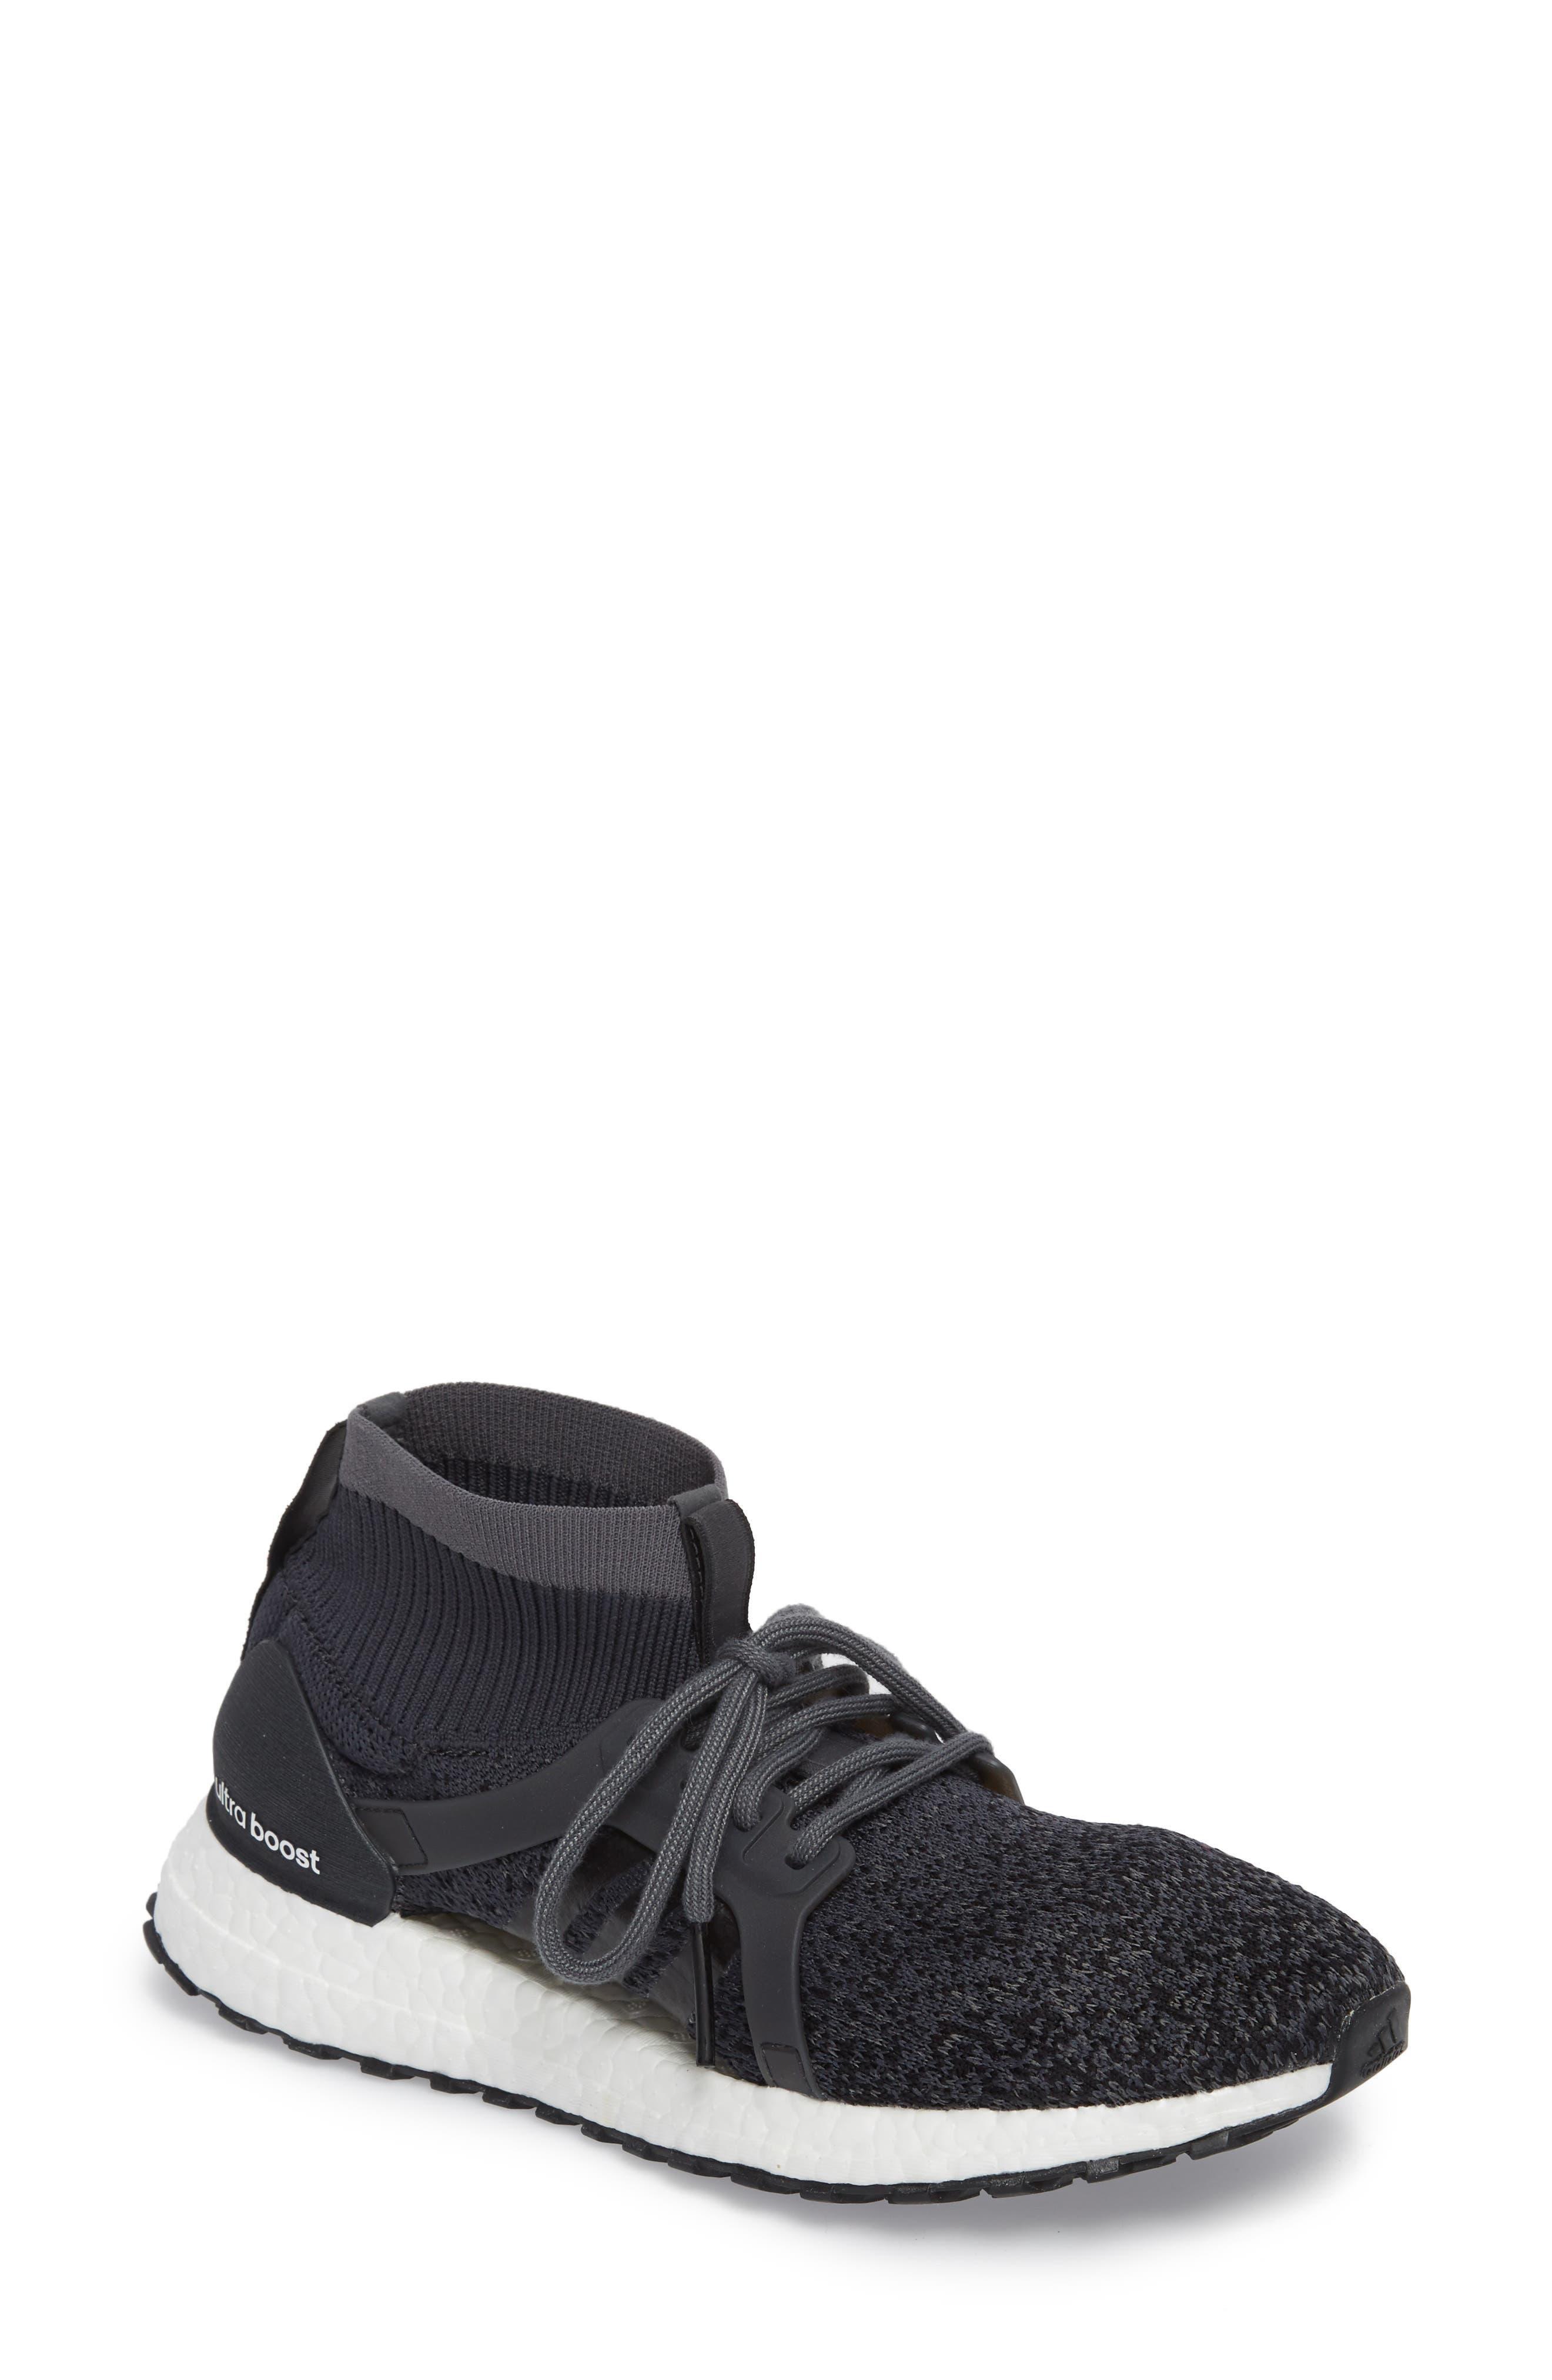 UltraBoost X All Terrain Water Resistant Running Shoe,                         Main,                         color, 001